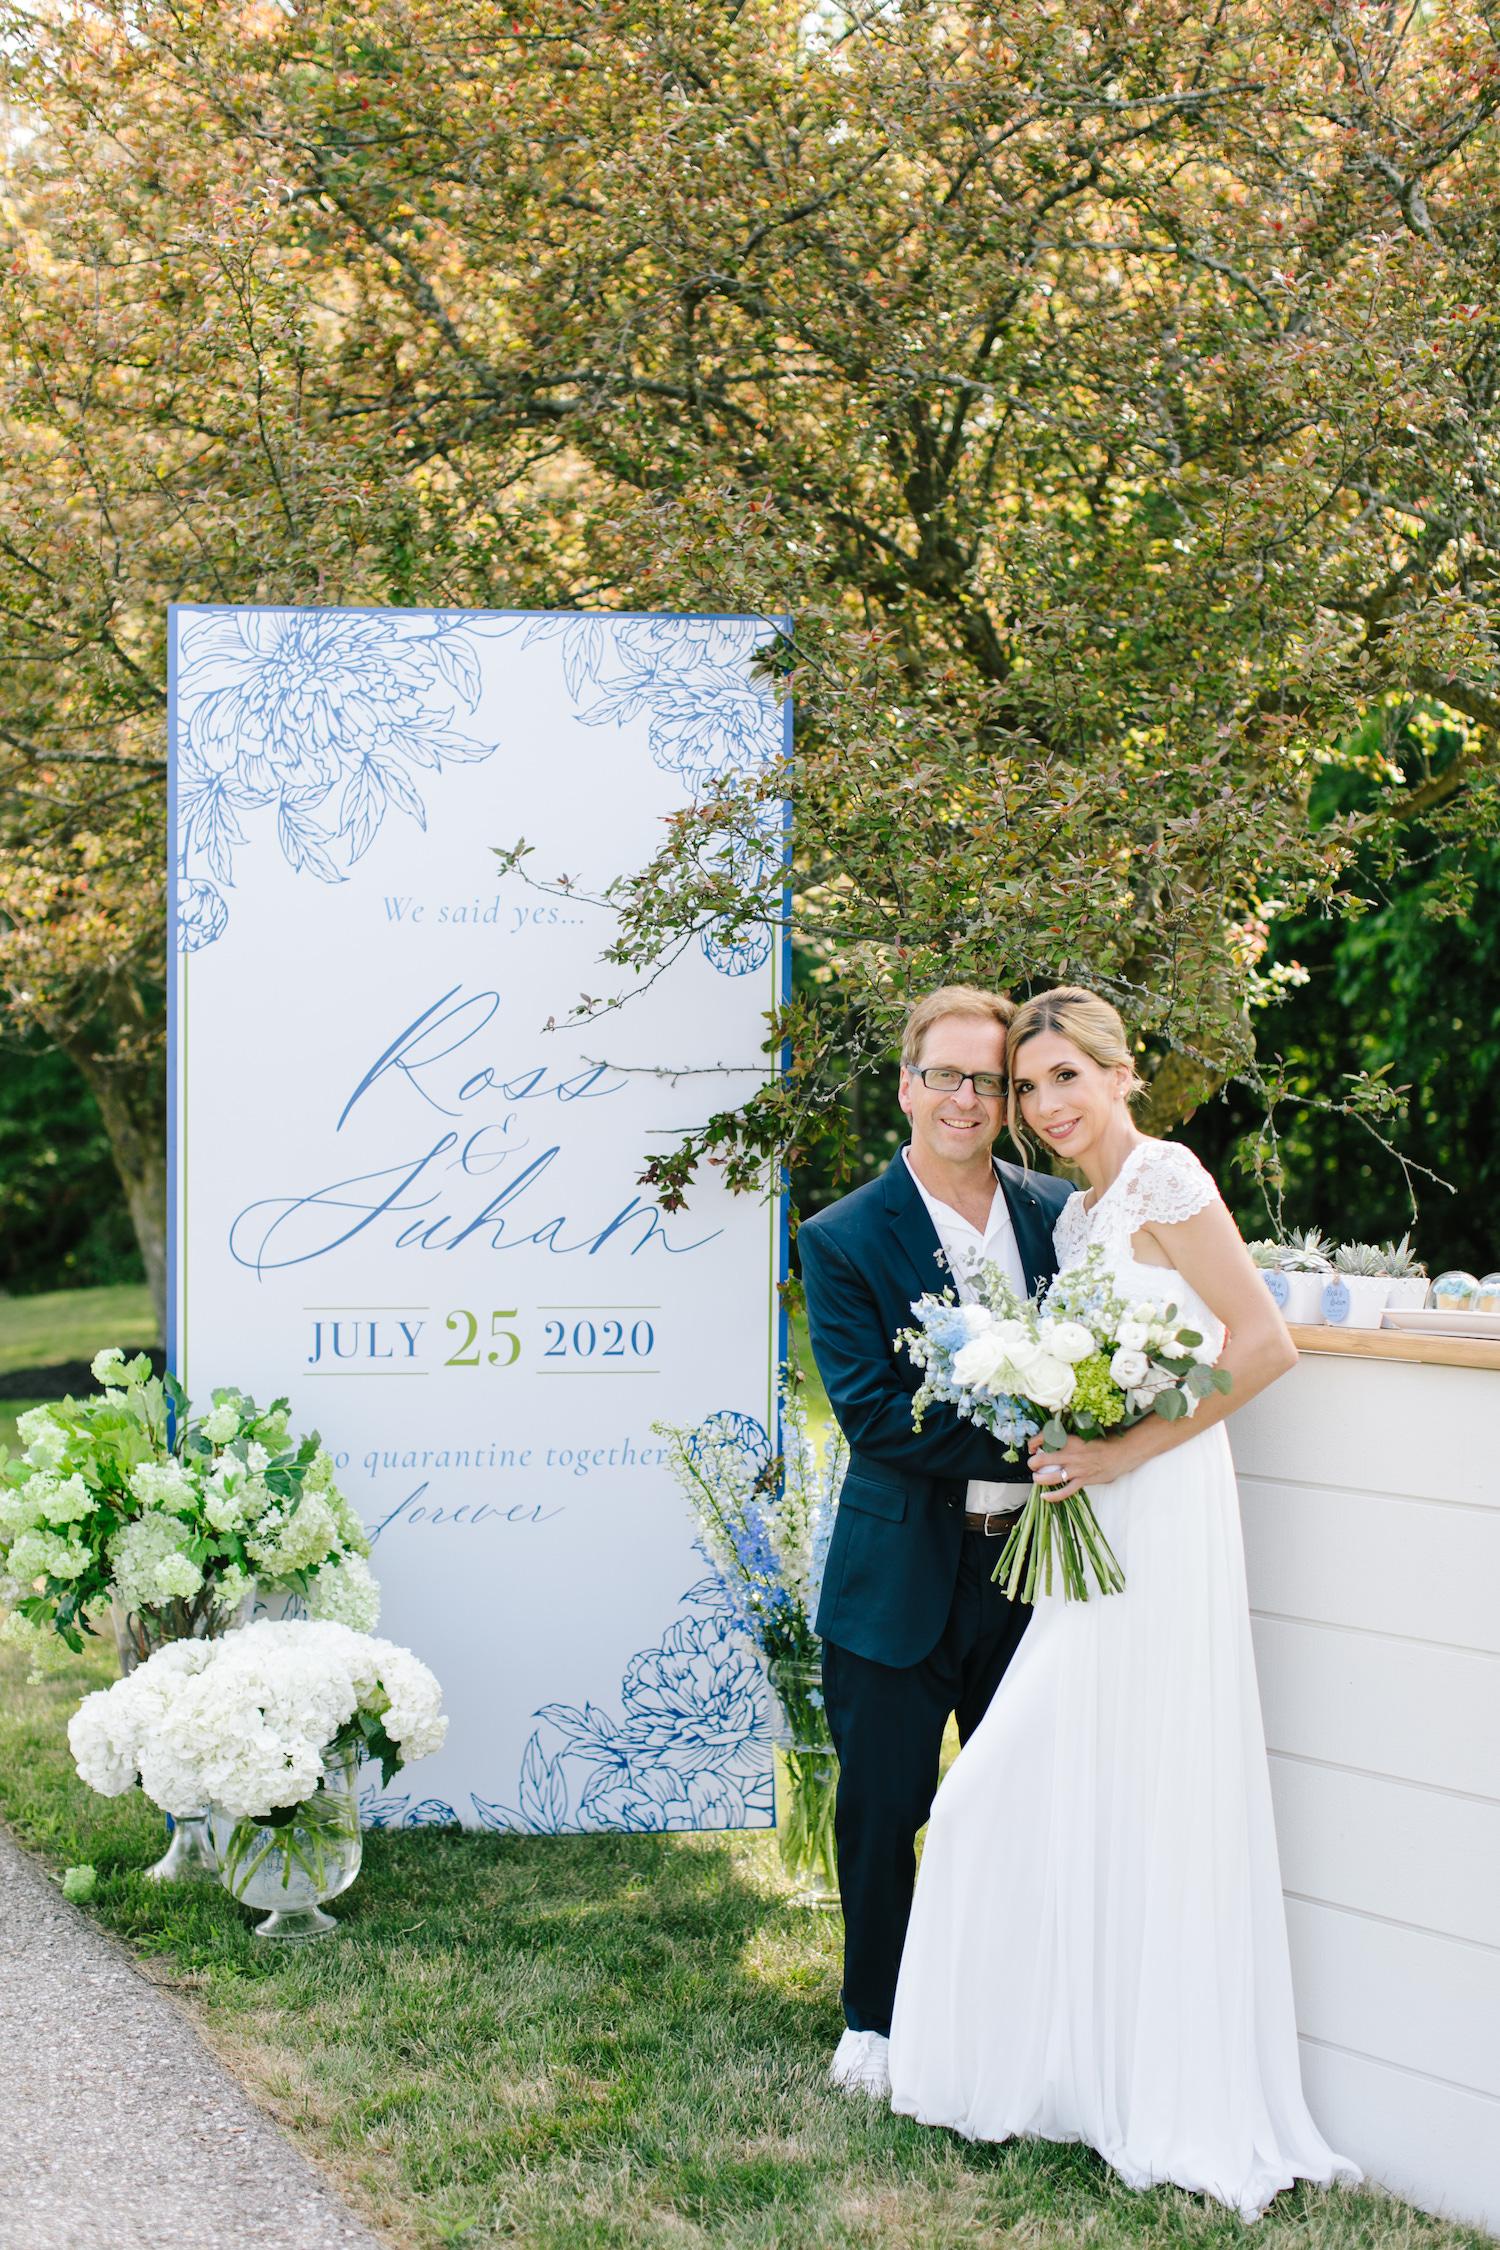 covid drive through wedding